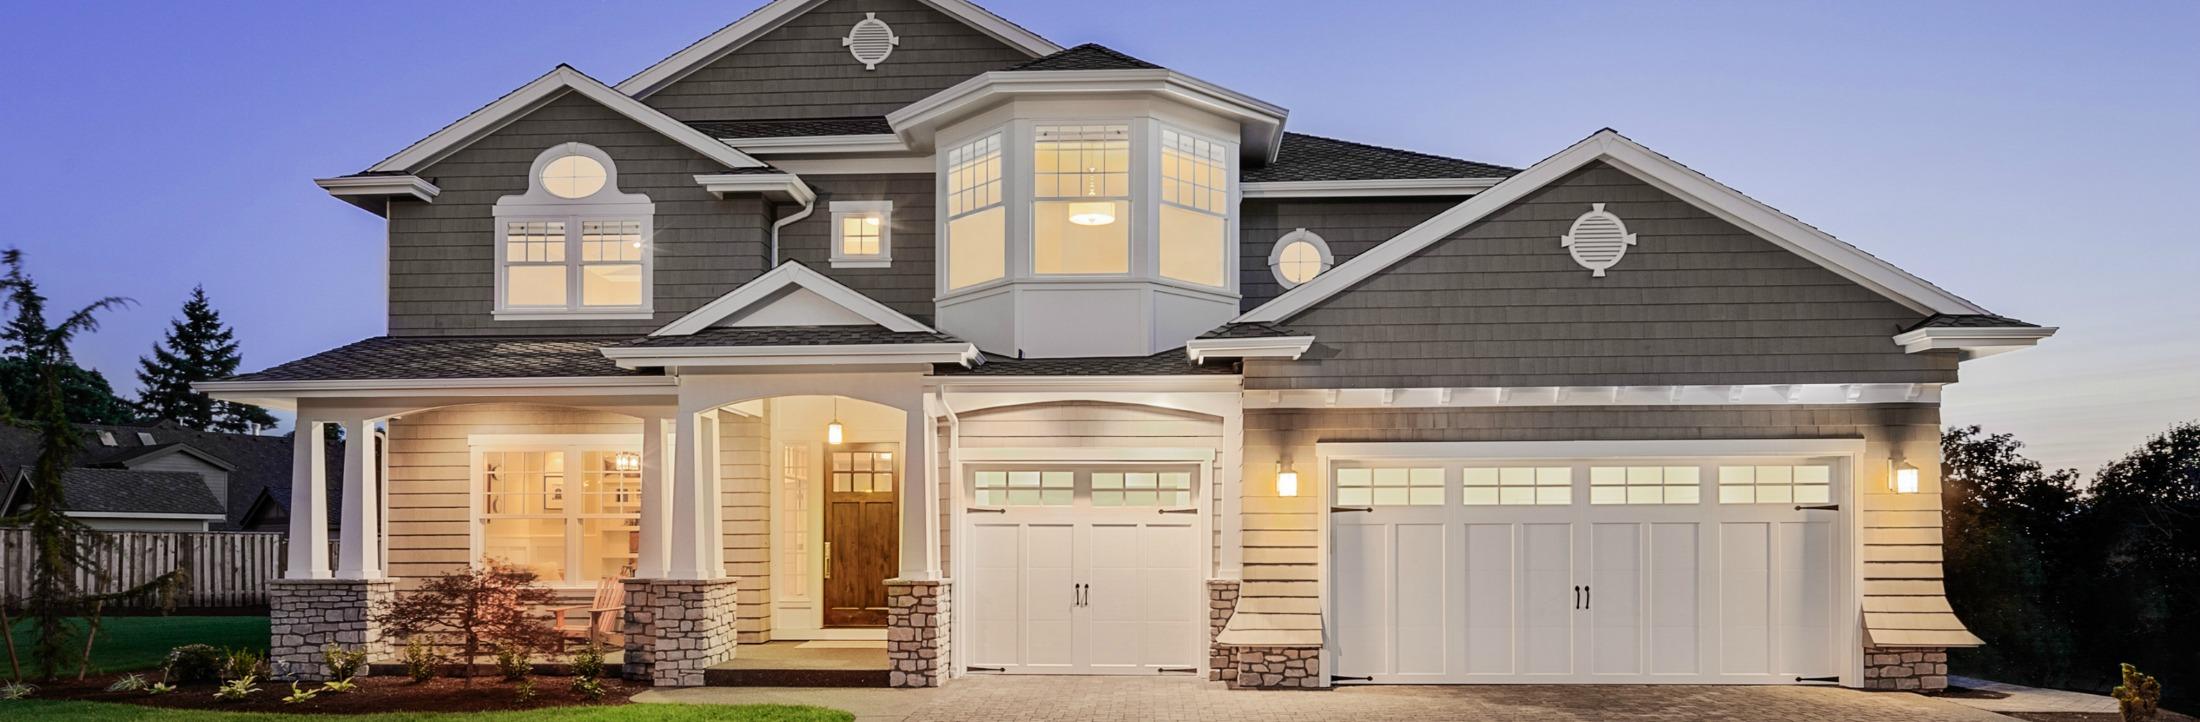 santa clarita valley homes for sale